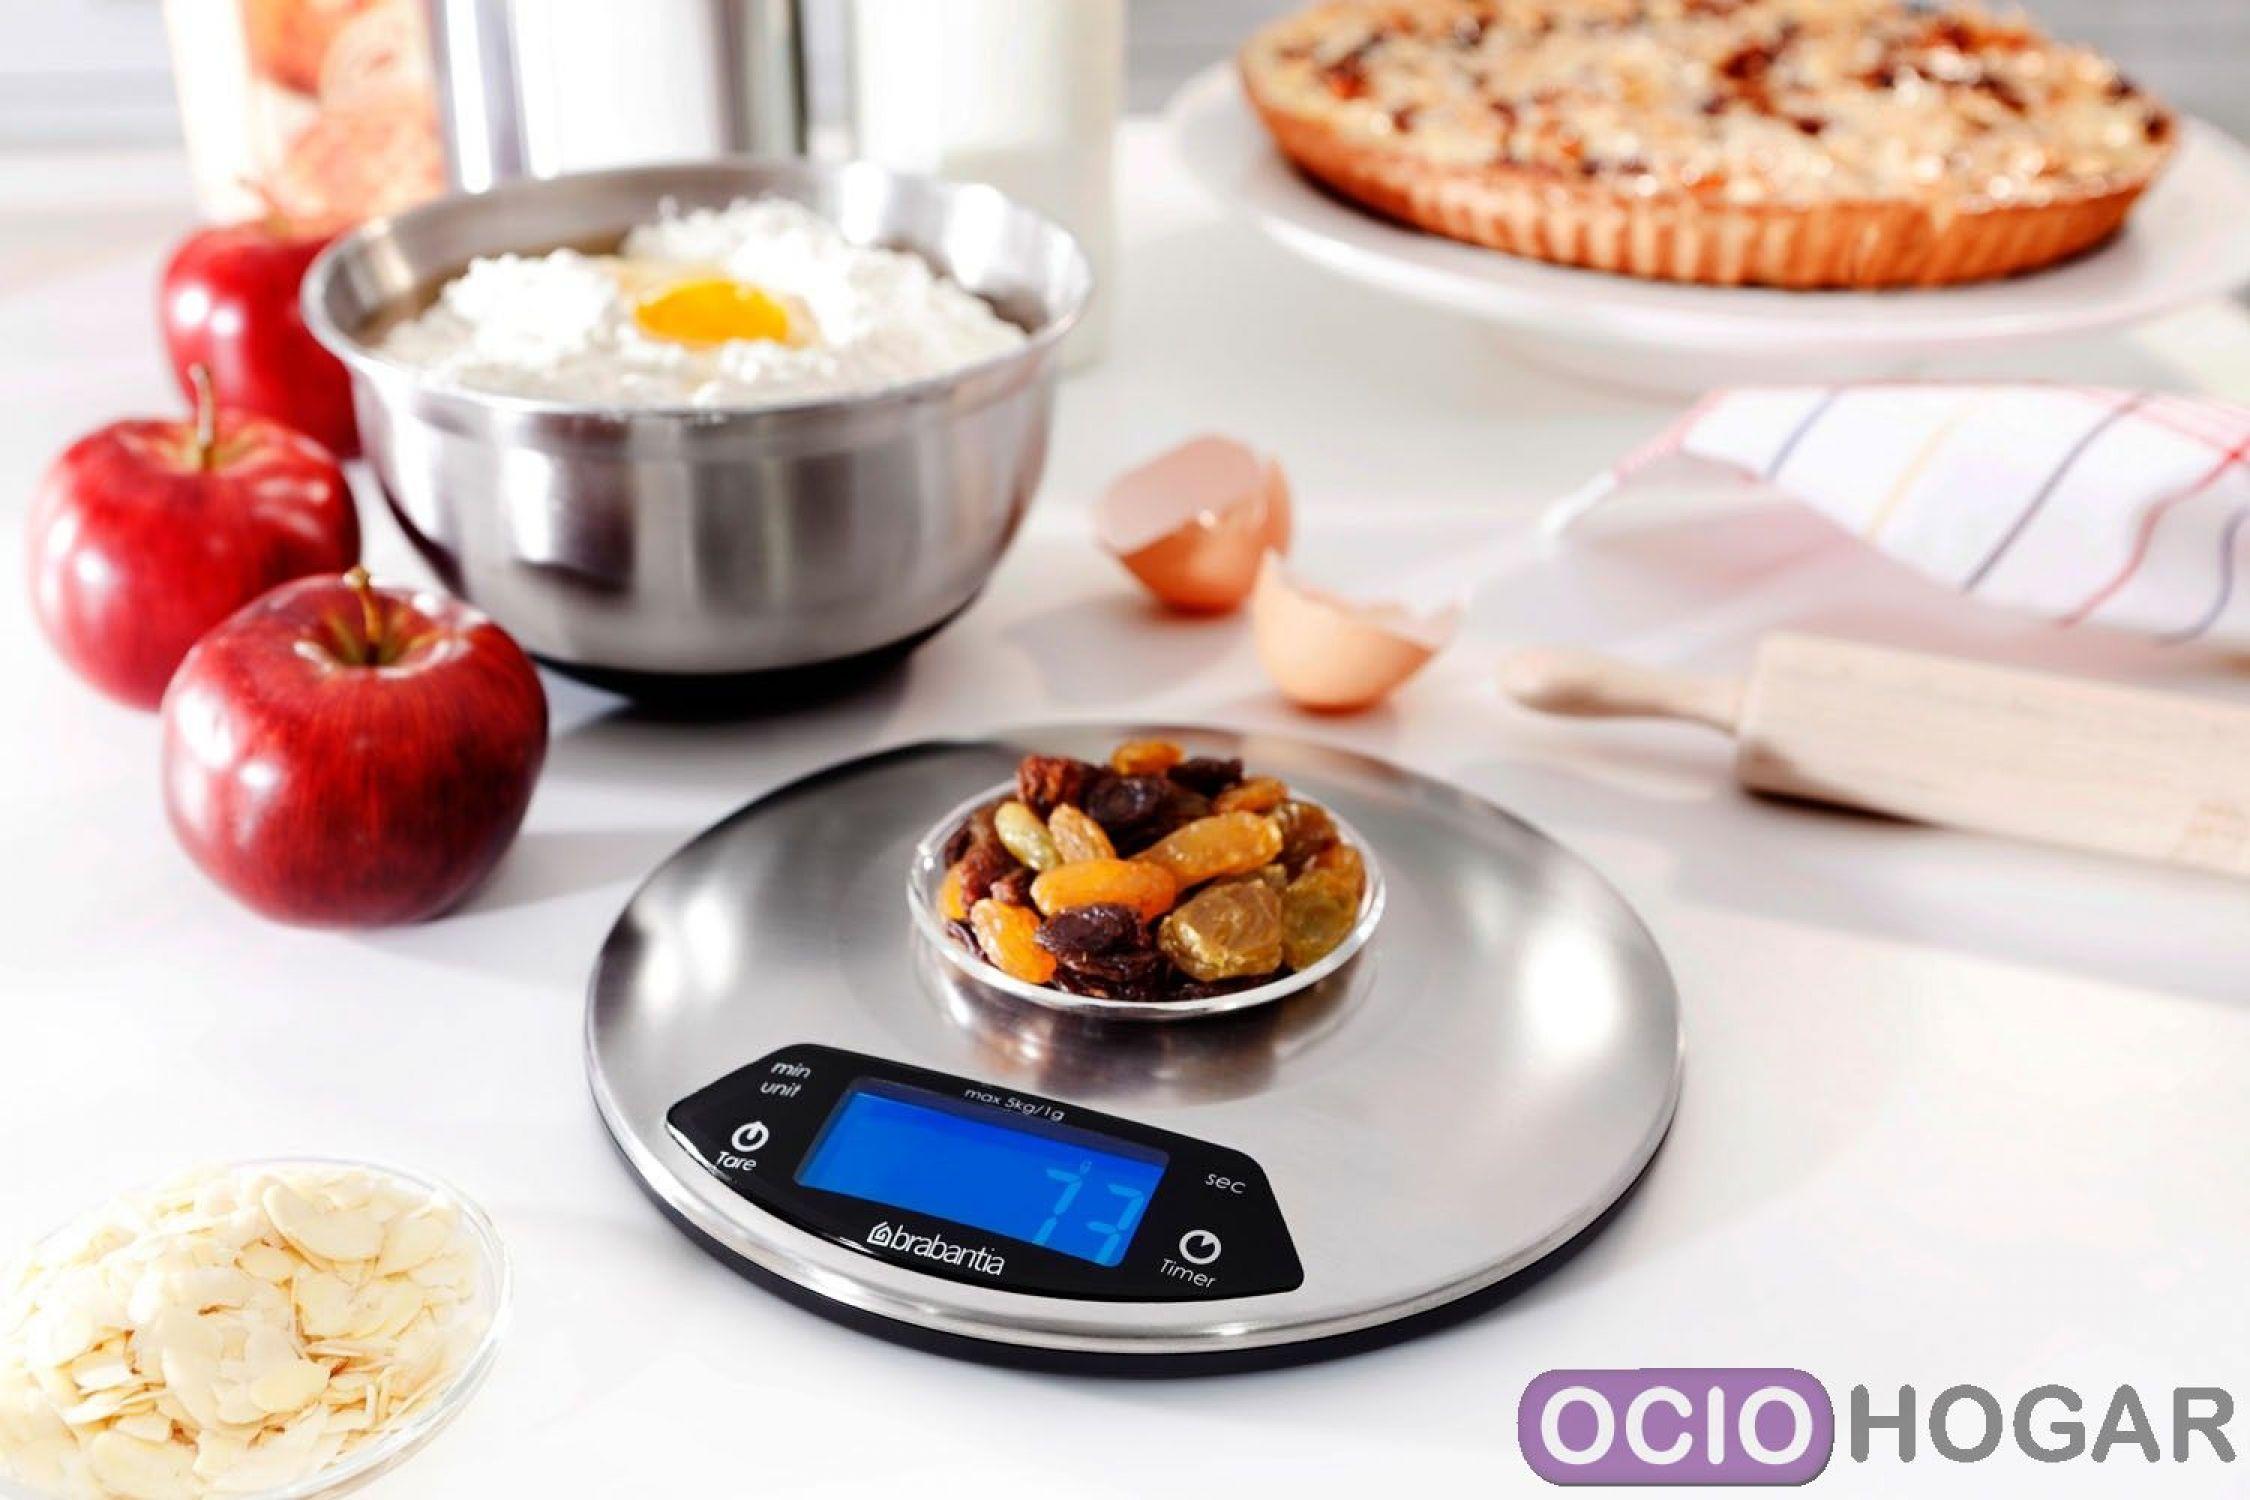 B scula de cocina digital matt steel de brabantia for Basculas digitales para cocina